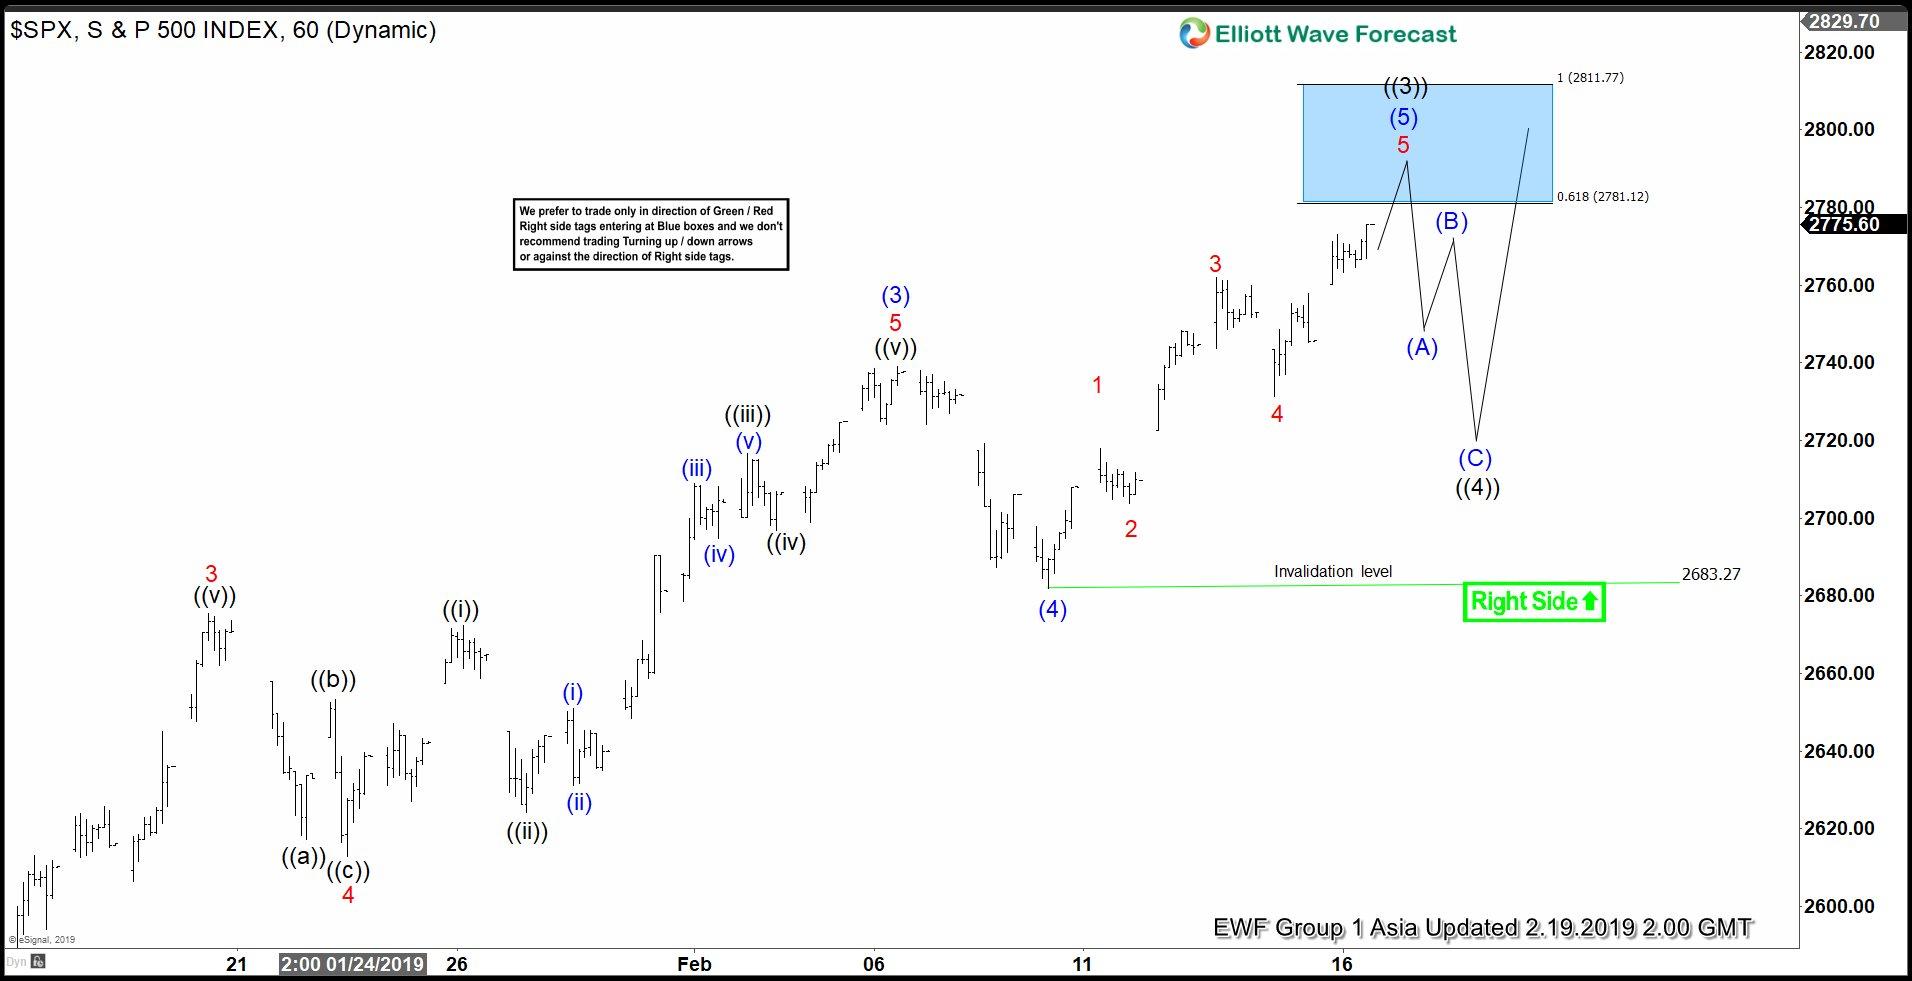 Elliott Wave View: S&P 500 (SPX) Rallies as an Impulse